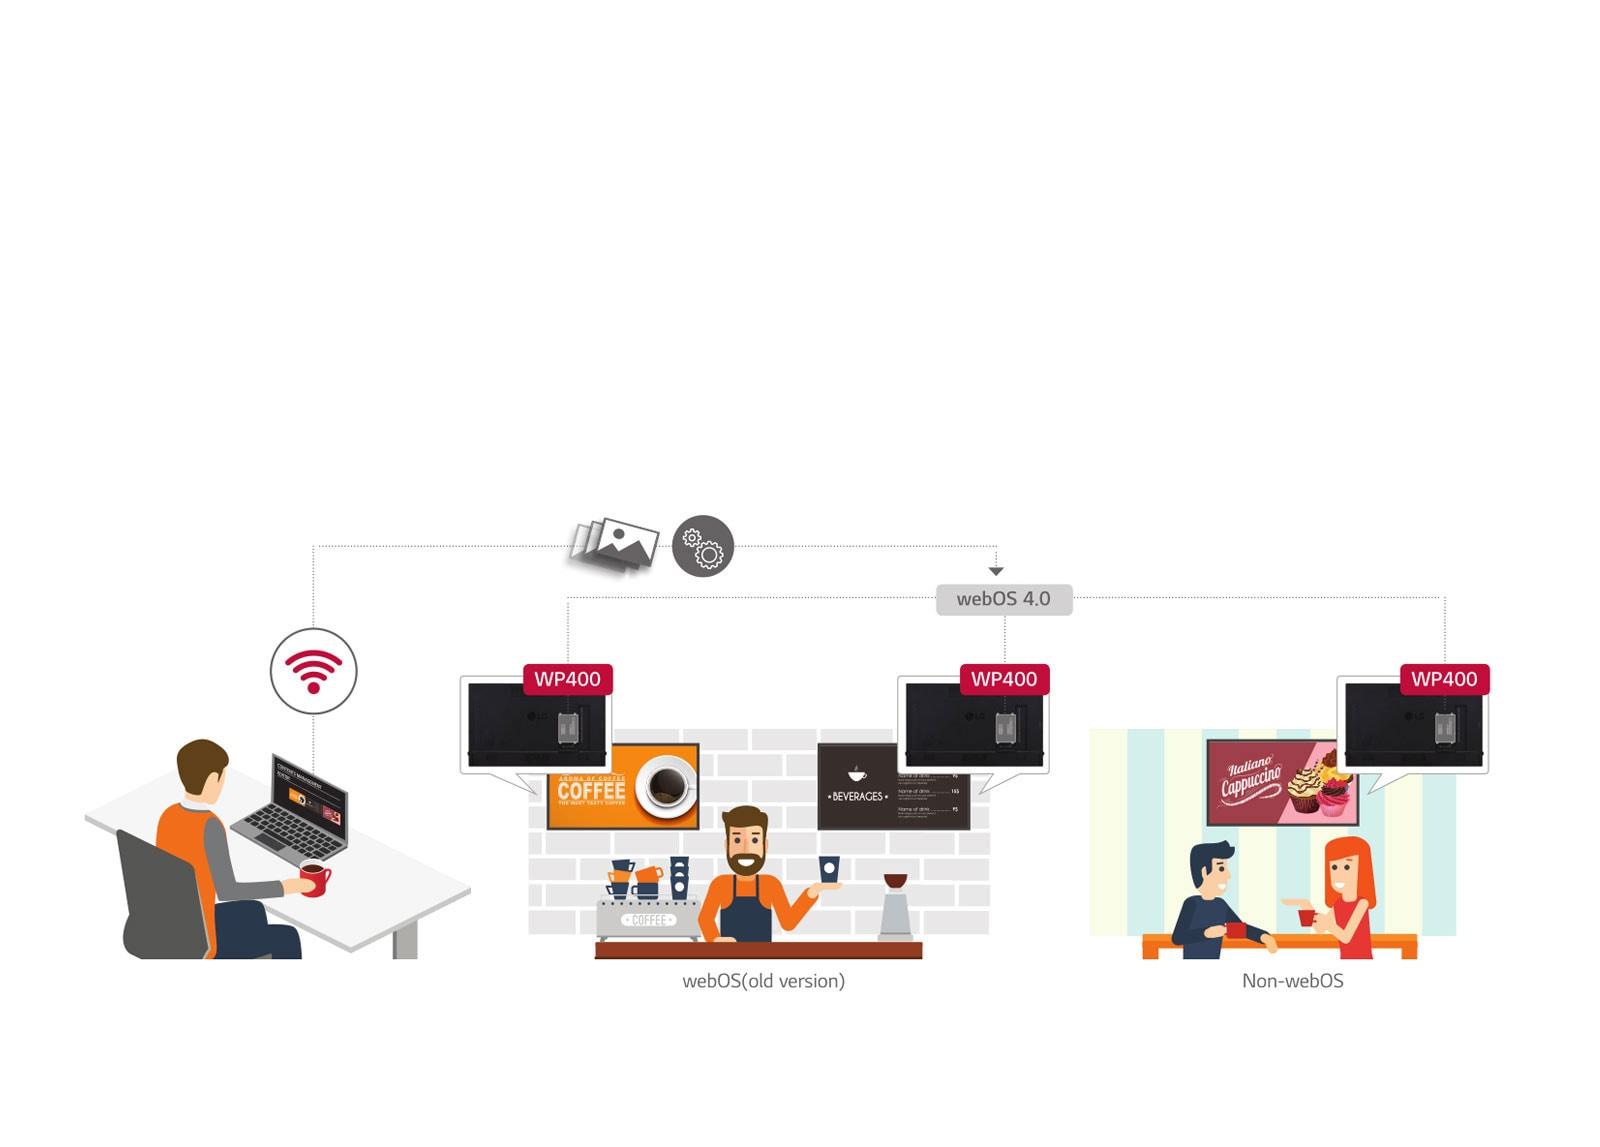 Upgrade to the webOS 4.0 Smart Signage Platform1